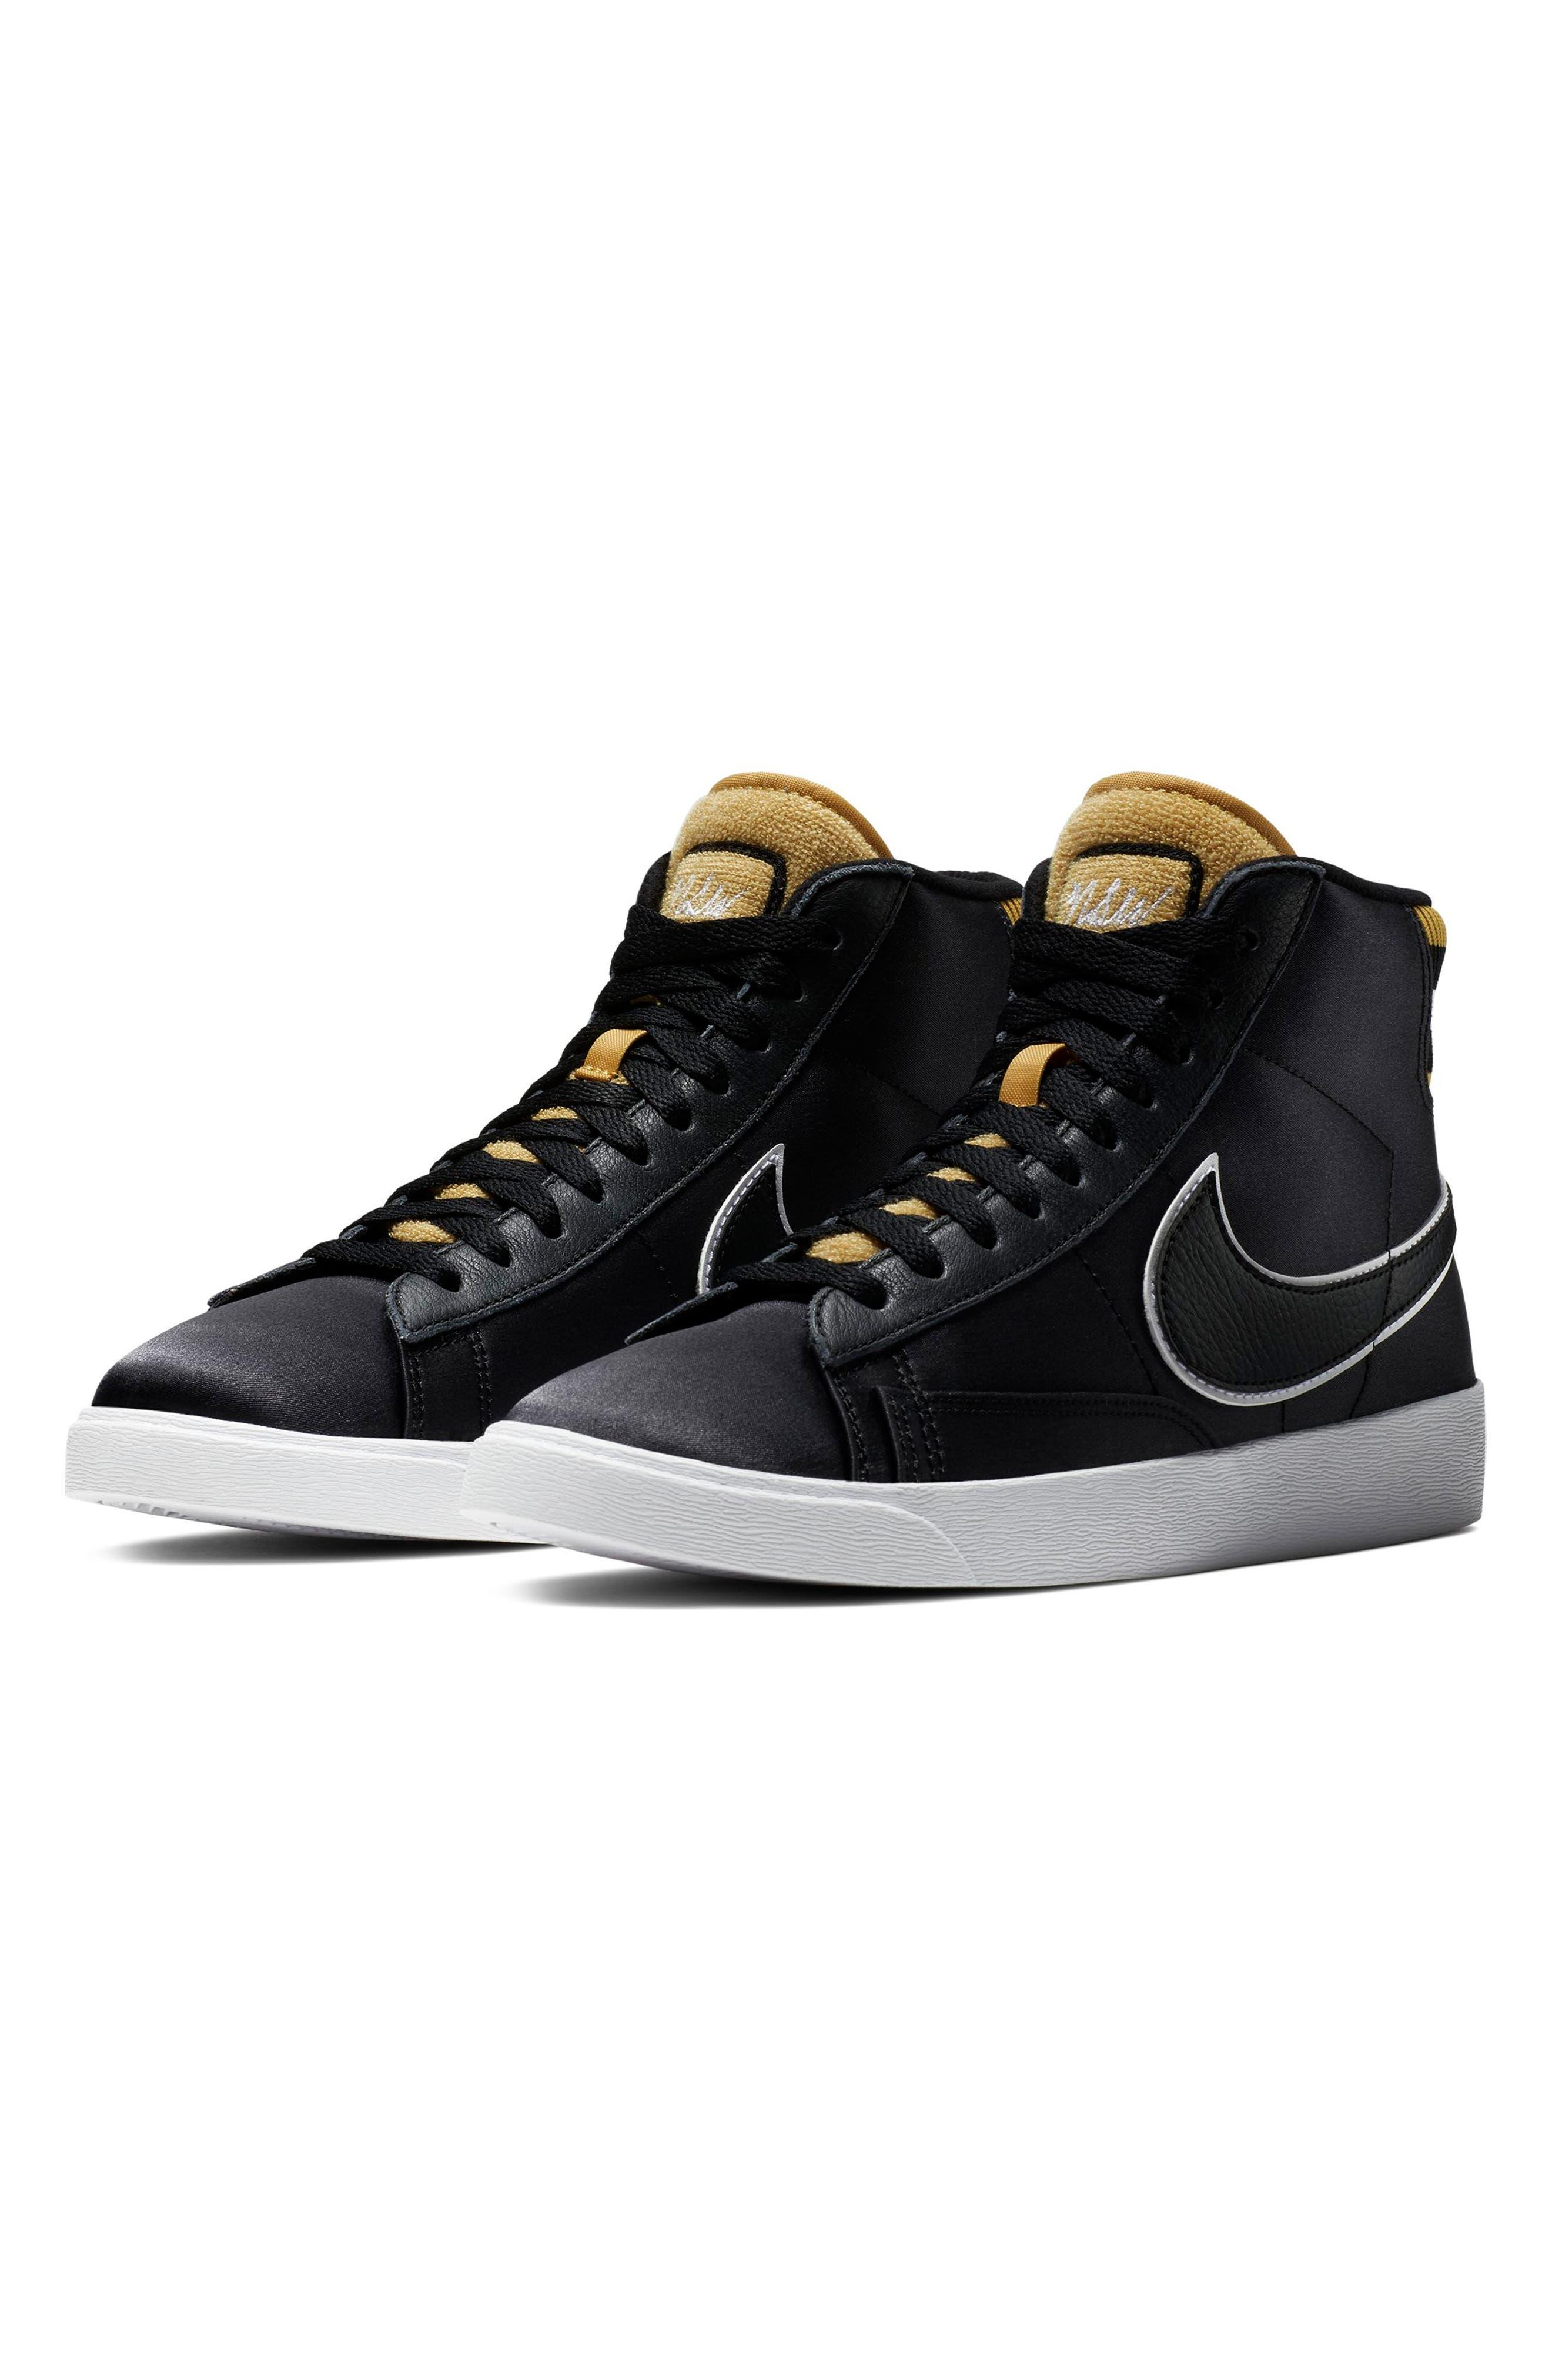 Blazer Mid Top Sneaker,                         Main,                         color, BLACK/ BLACK